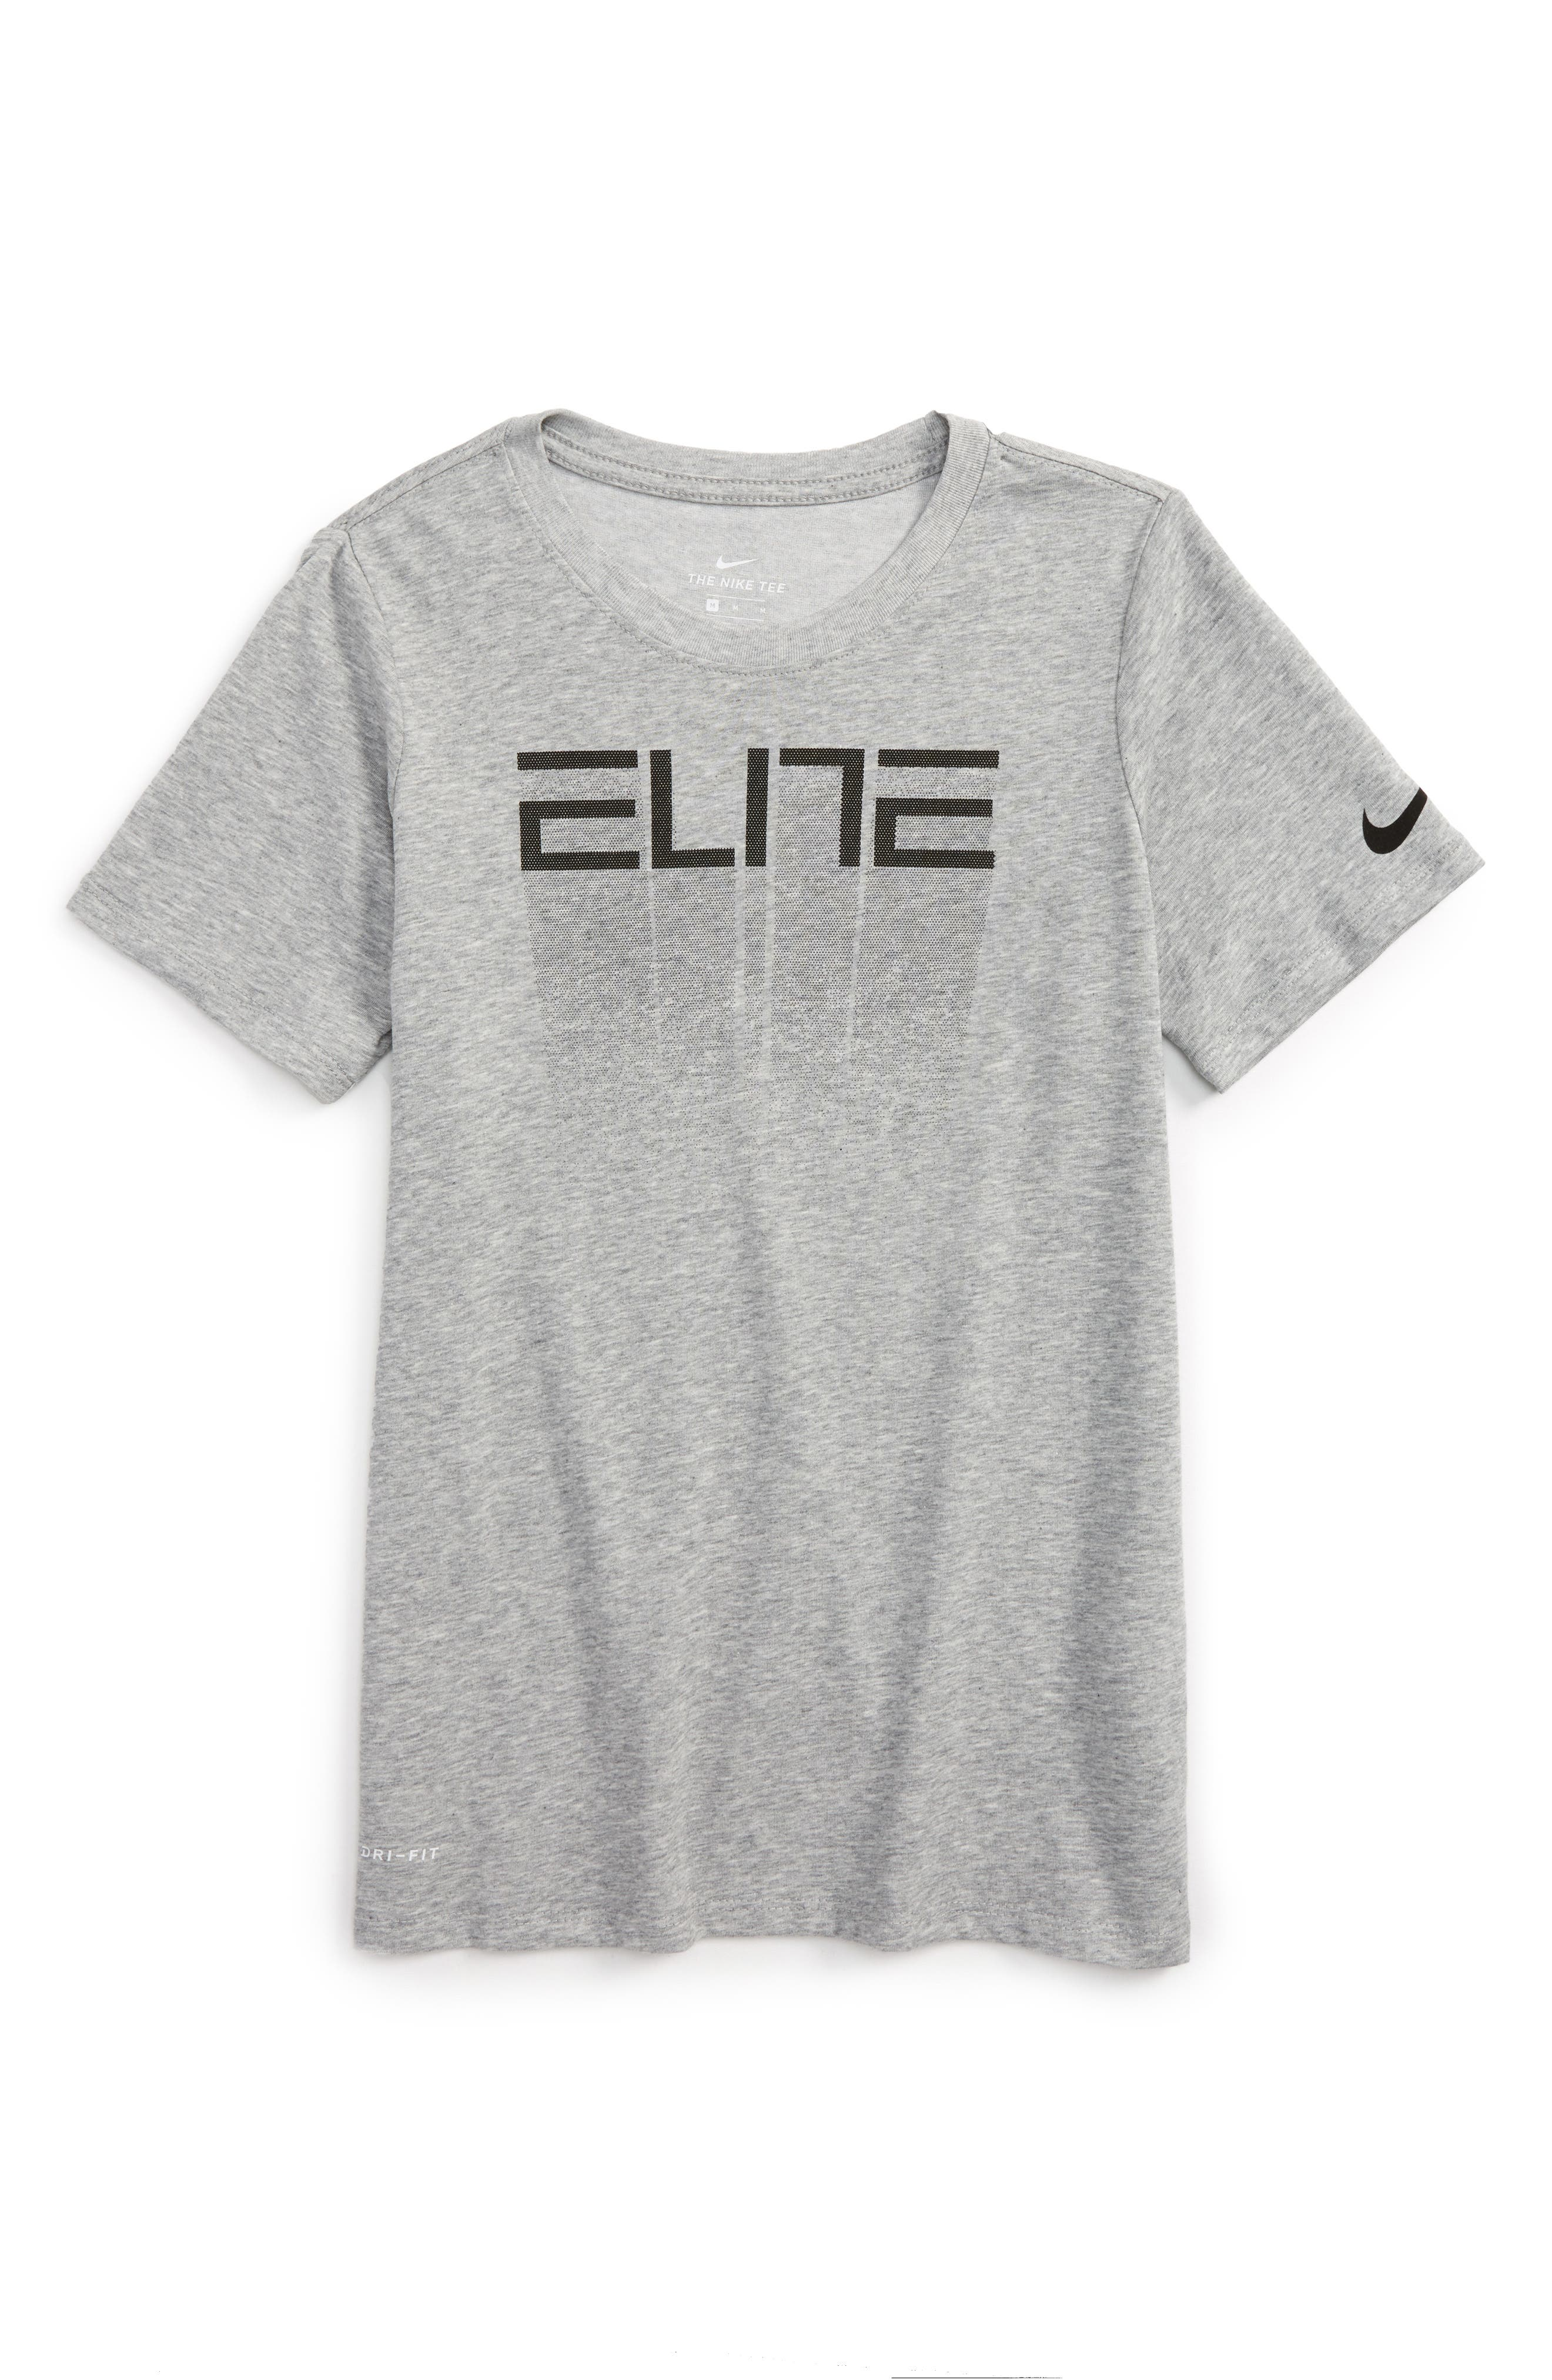 Nike Dry Elite Fade Away Graphic T-Shirt